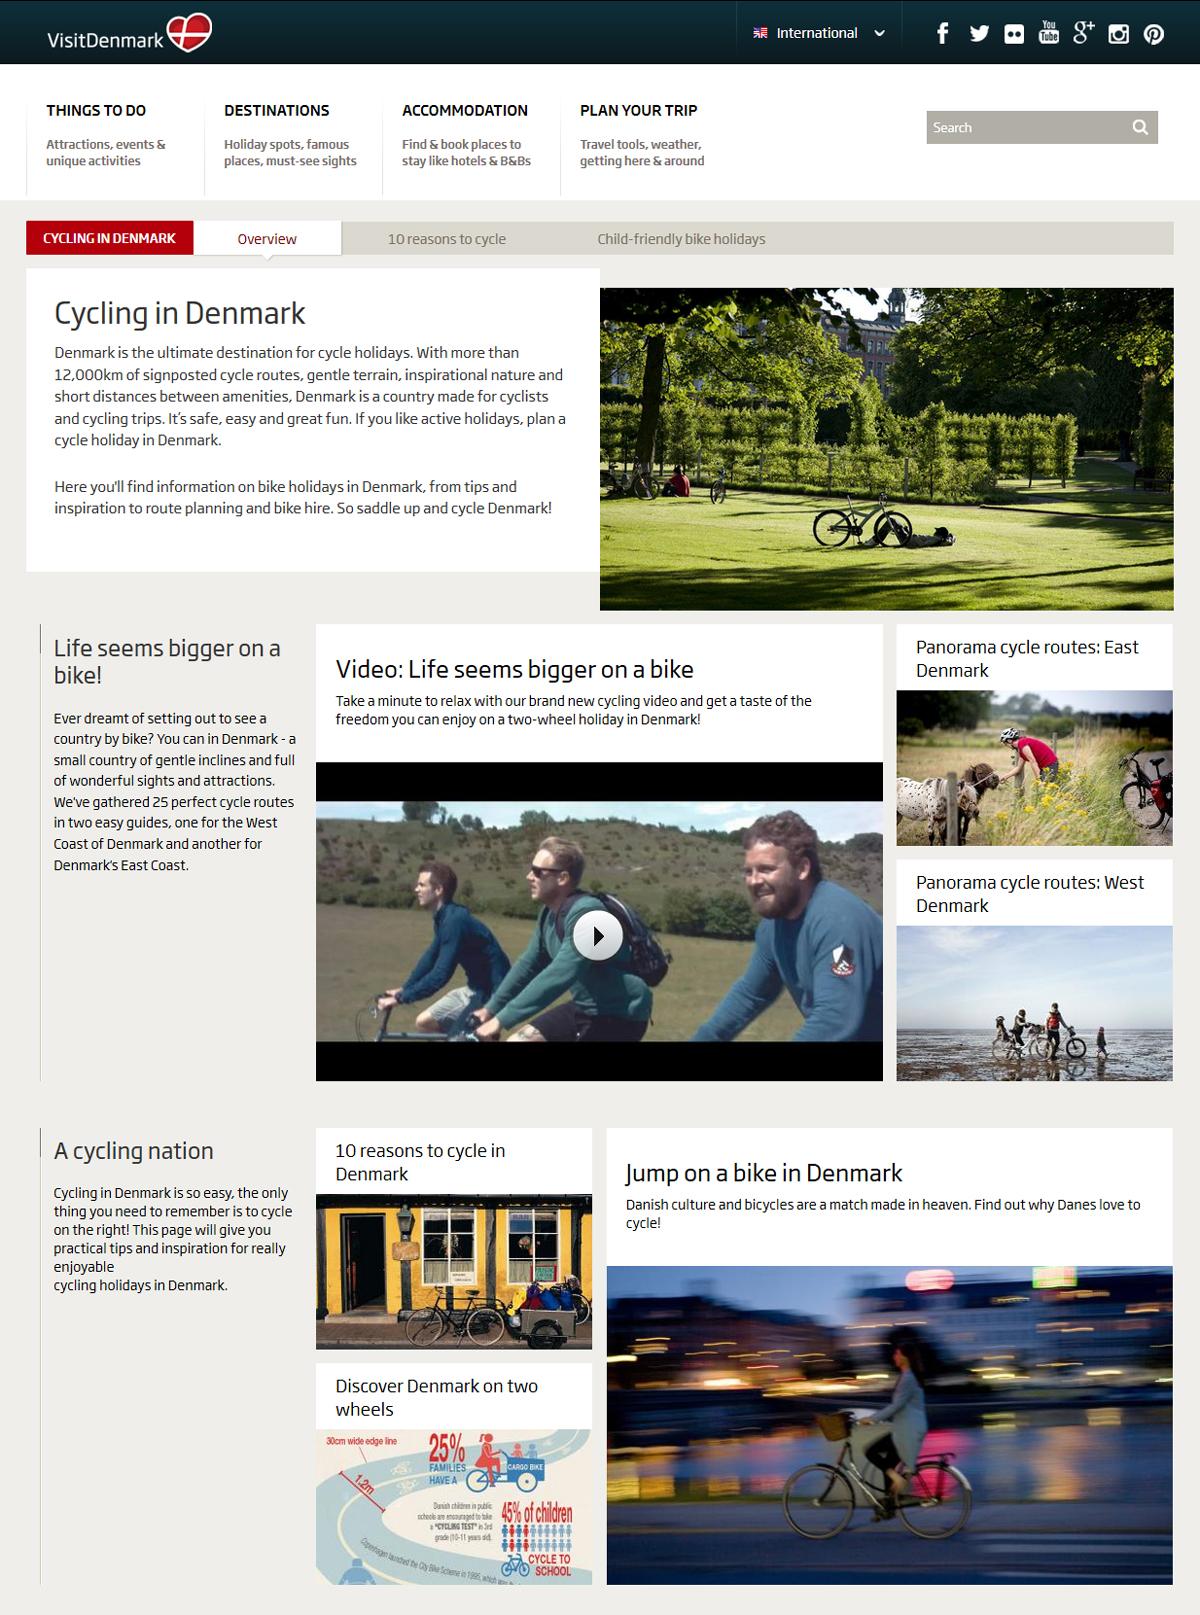 visitdenmark.com